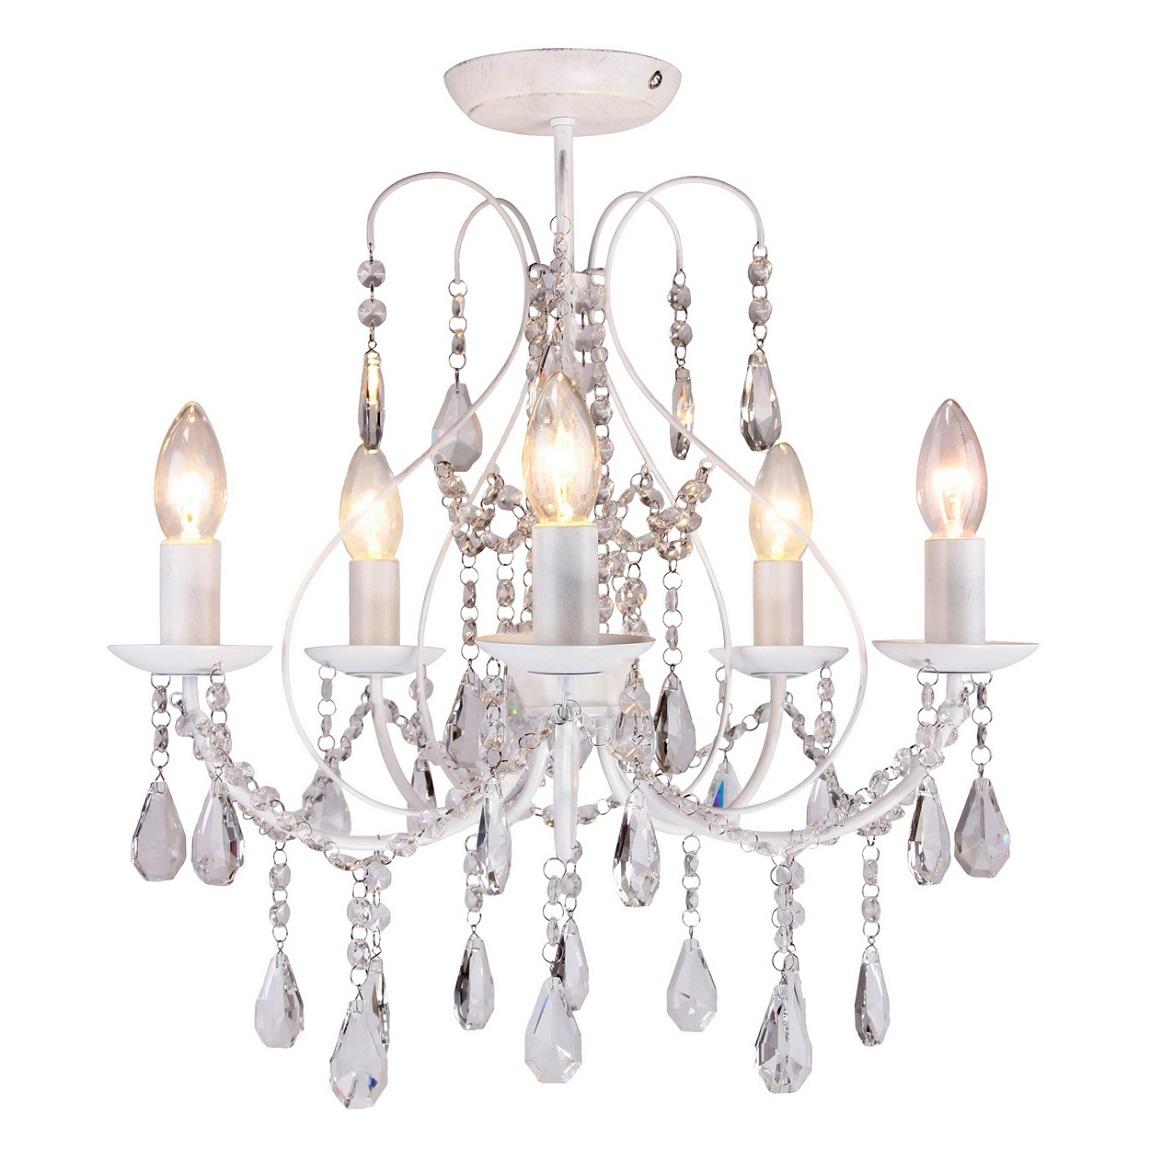 Debenhams Home Collection Katherine Flush Ceiling Light